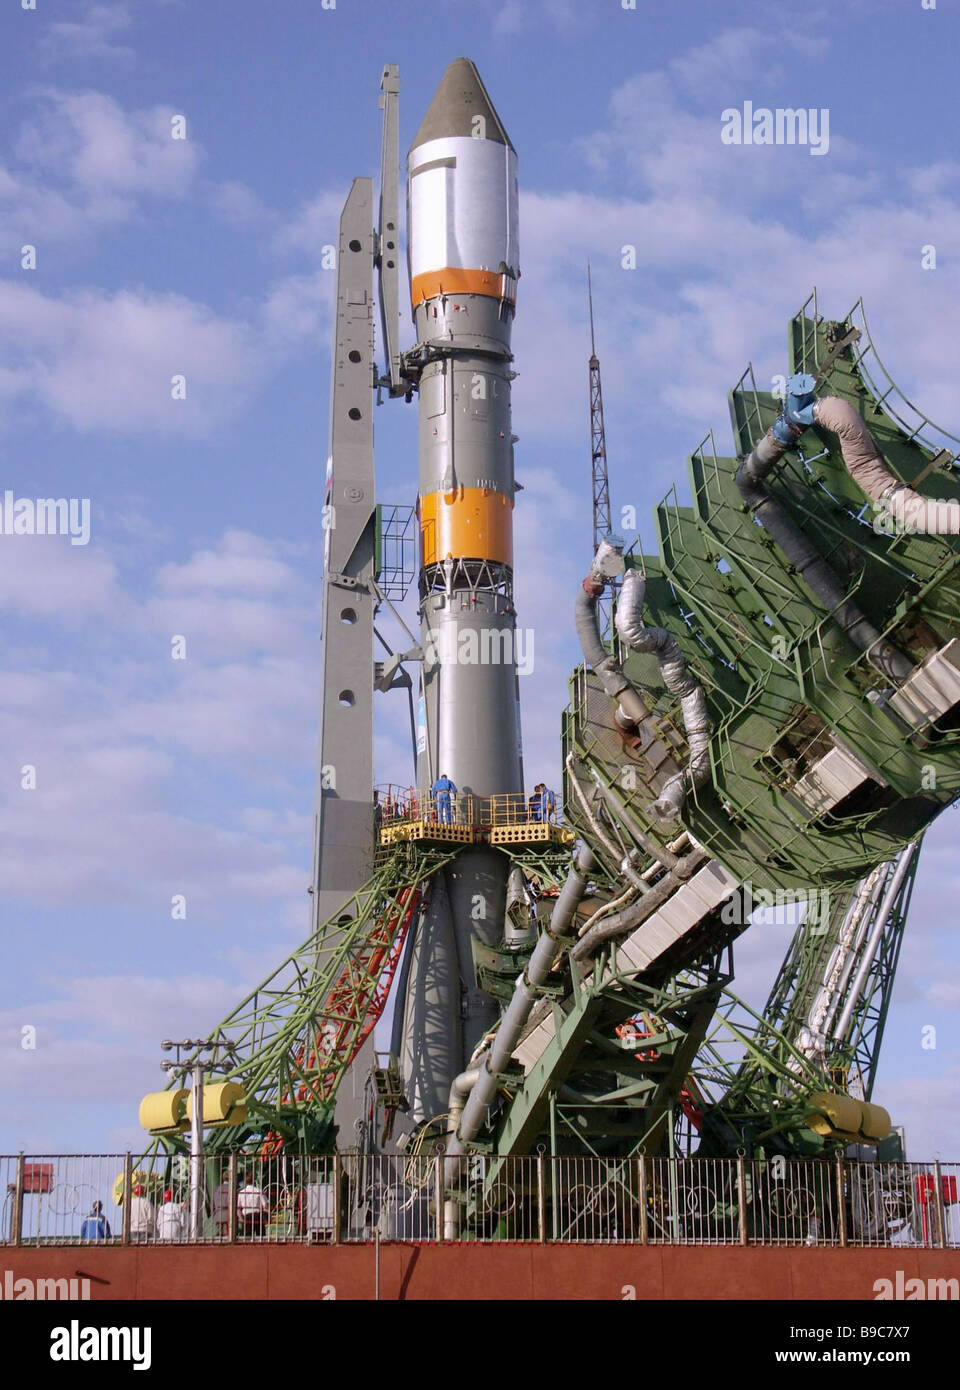 Carrier rocket Soyuz U bound to put into orbit a Kosmos spacecraft on the Baikonur launch complex - Stock Image